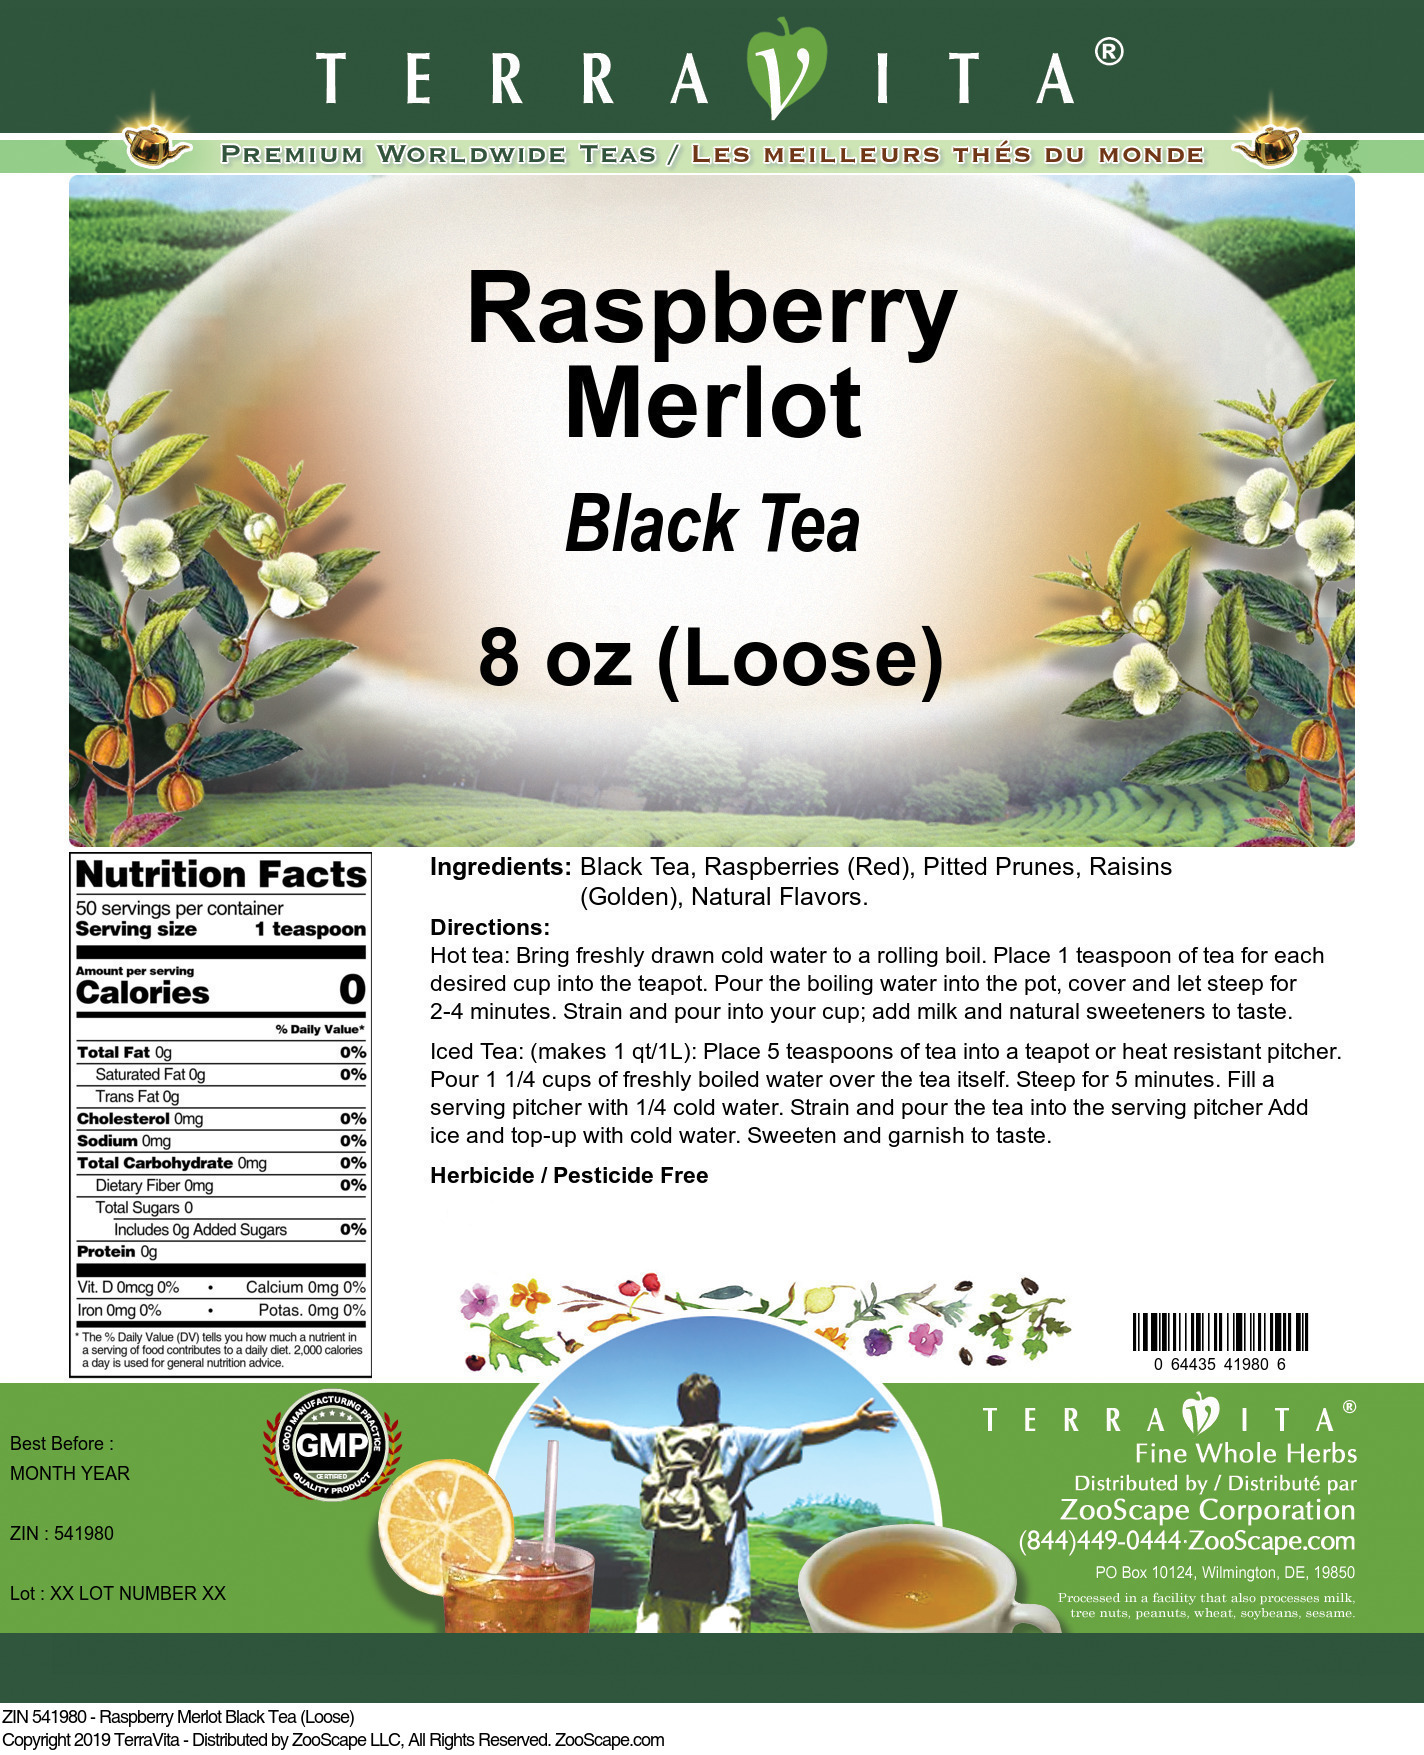 Raspberry Merlot Black Tea